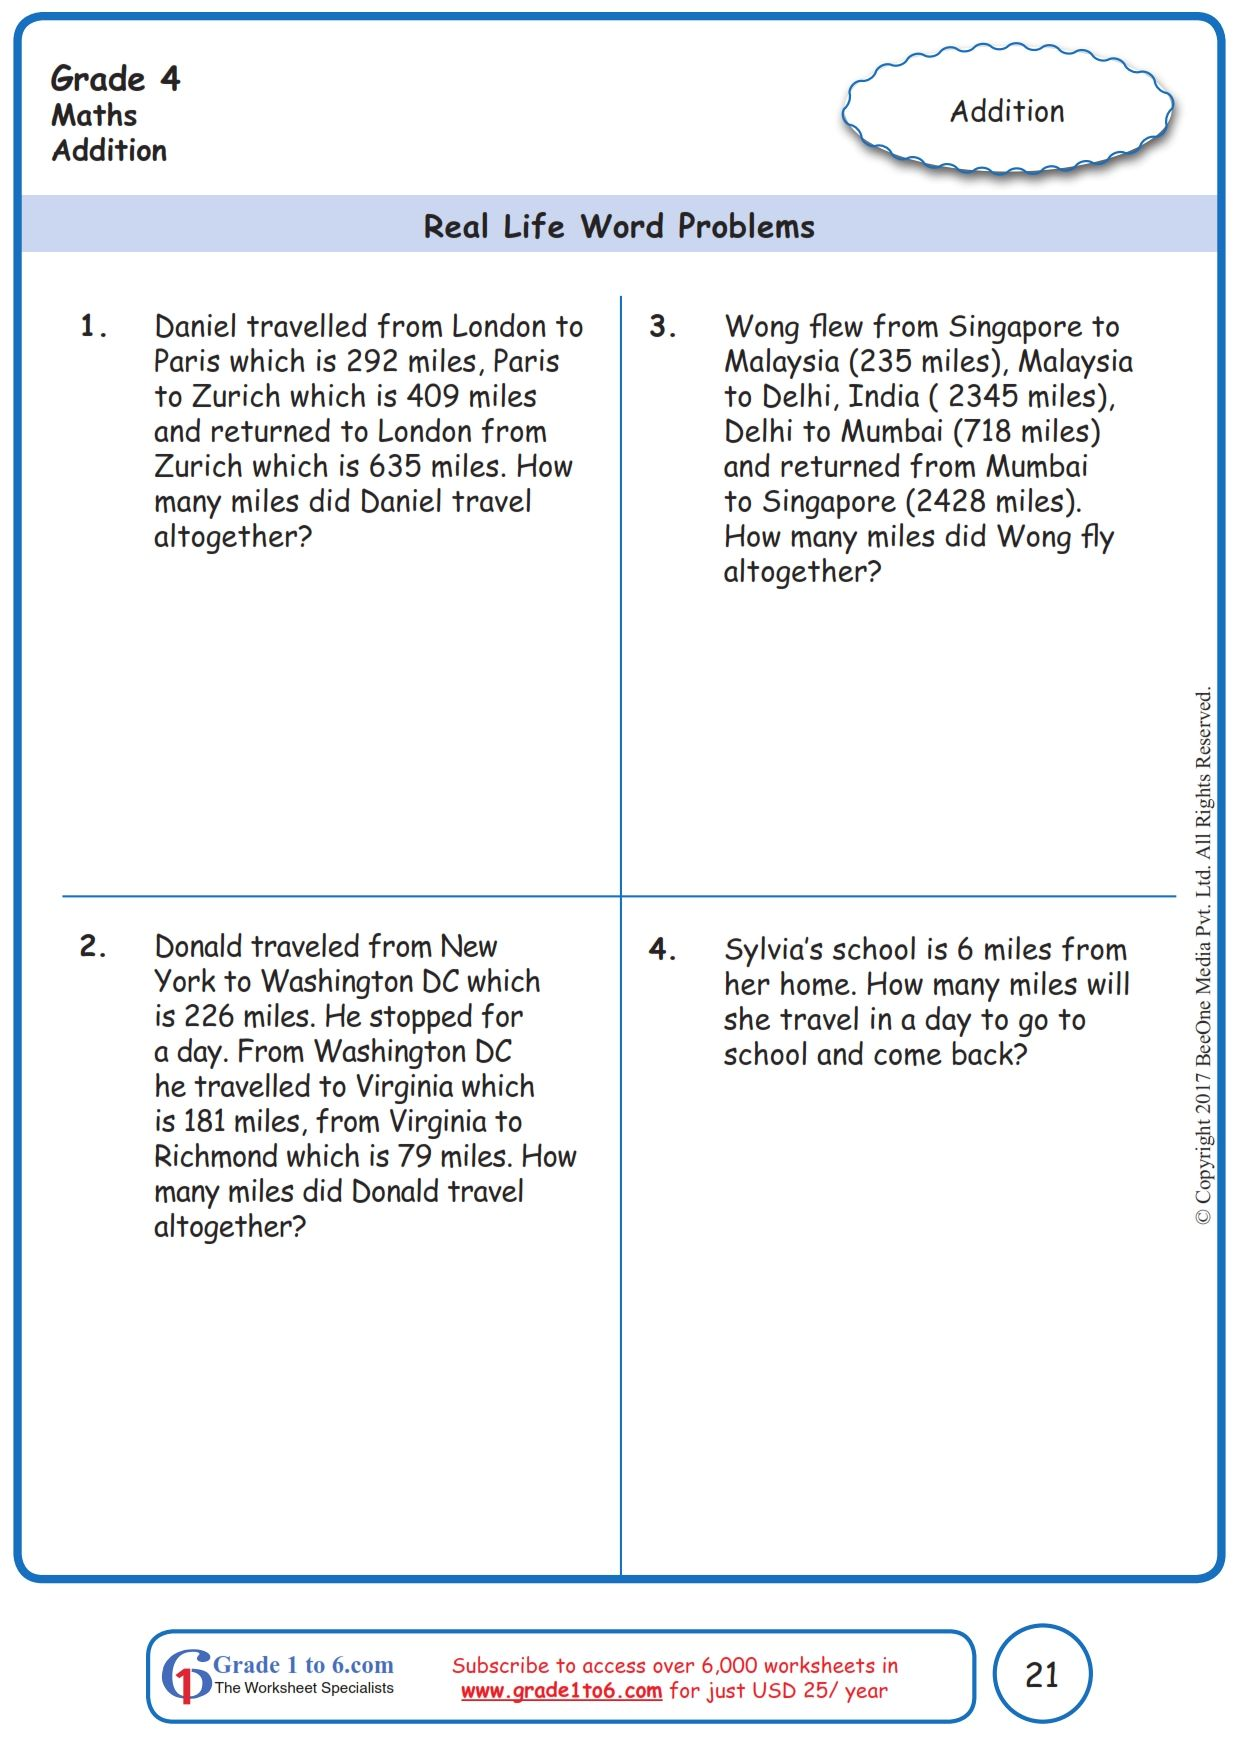 medium resolution of Pin on Grade 4 Math Worksheets: PYP/CBSE/ICSE/Common Core